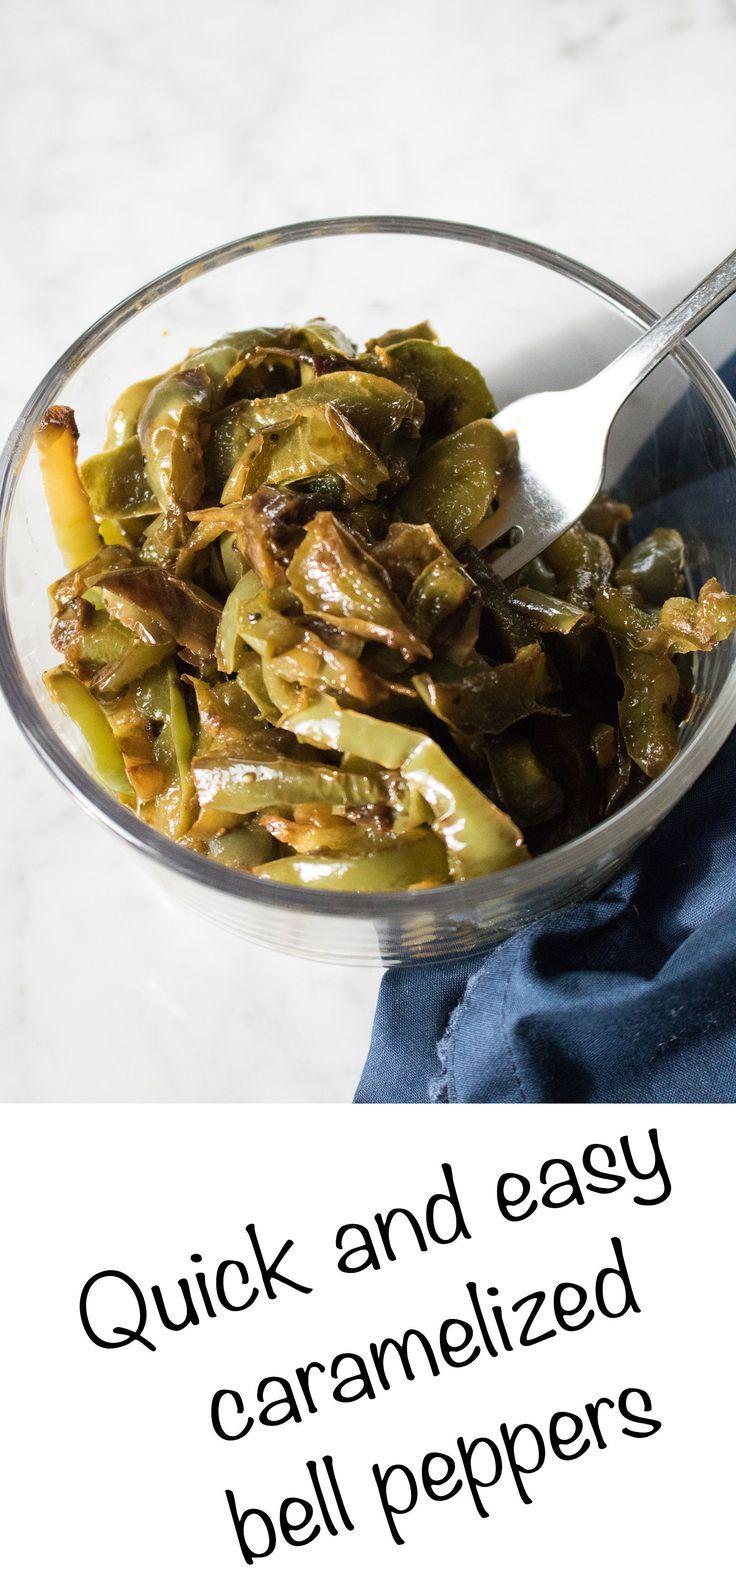 Caramelized green bell peppers #bellpepperrecipes